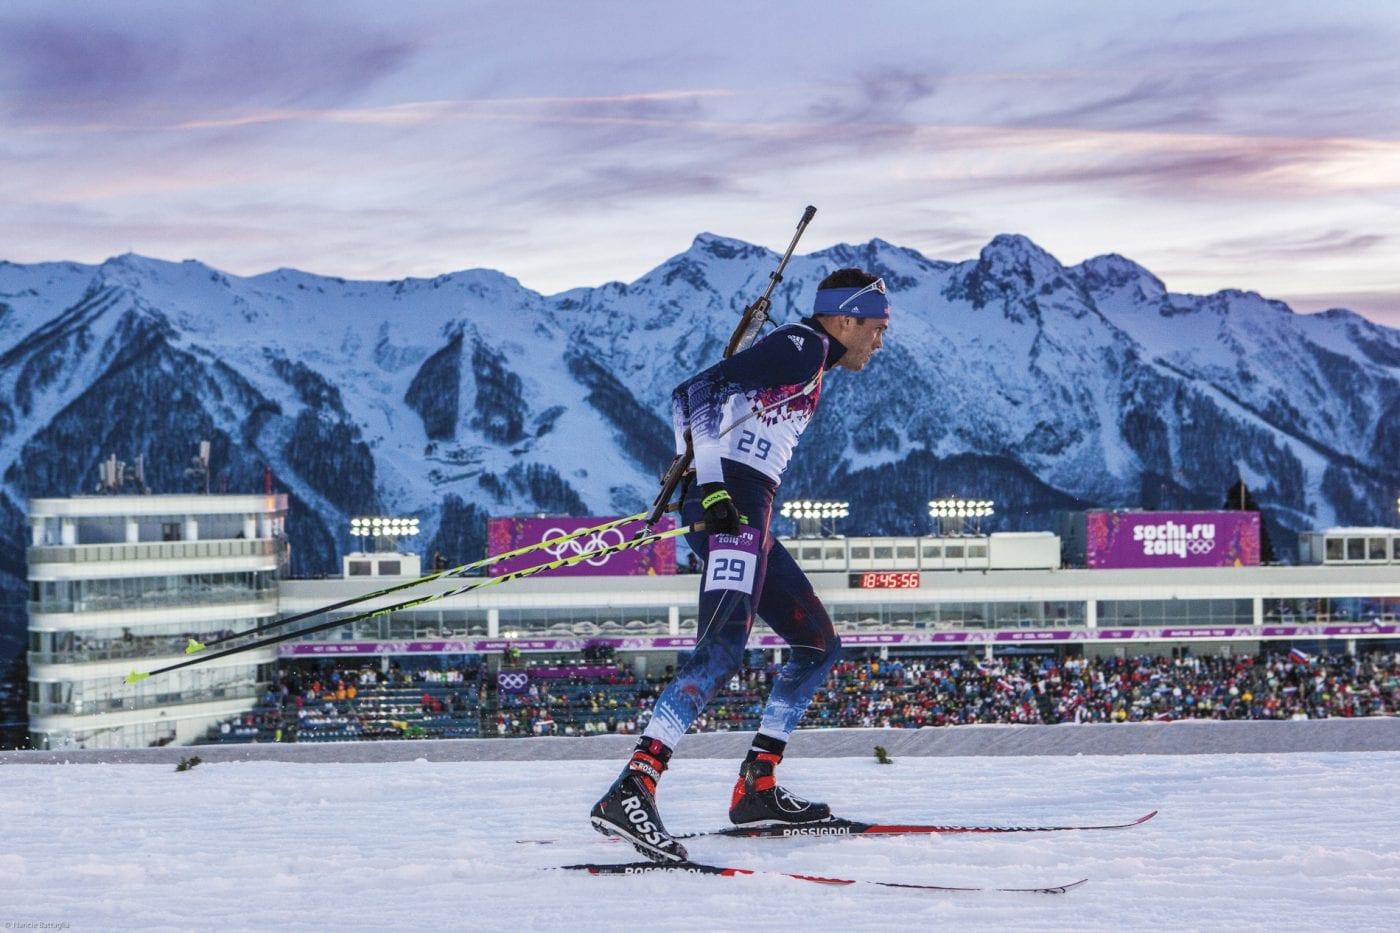 Biathlete Tim Burke skis at the 2014 Sochi Winter Olympics.